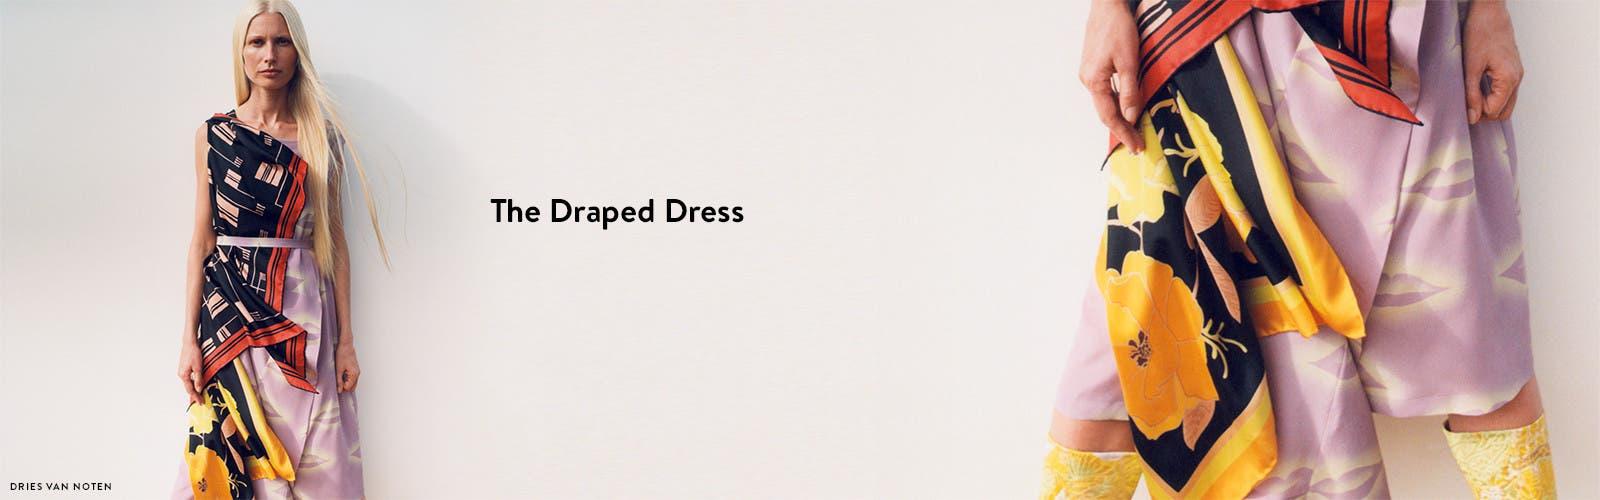 Draped designer dresses from Dries Van Noten and more.